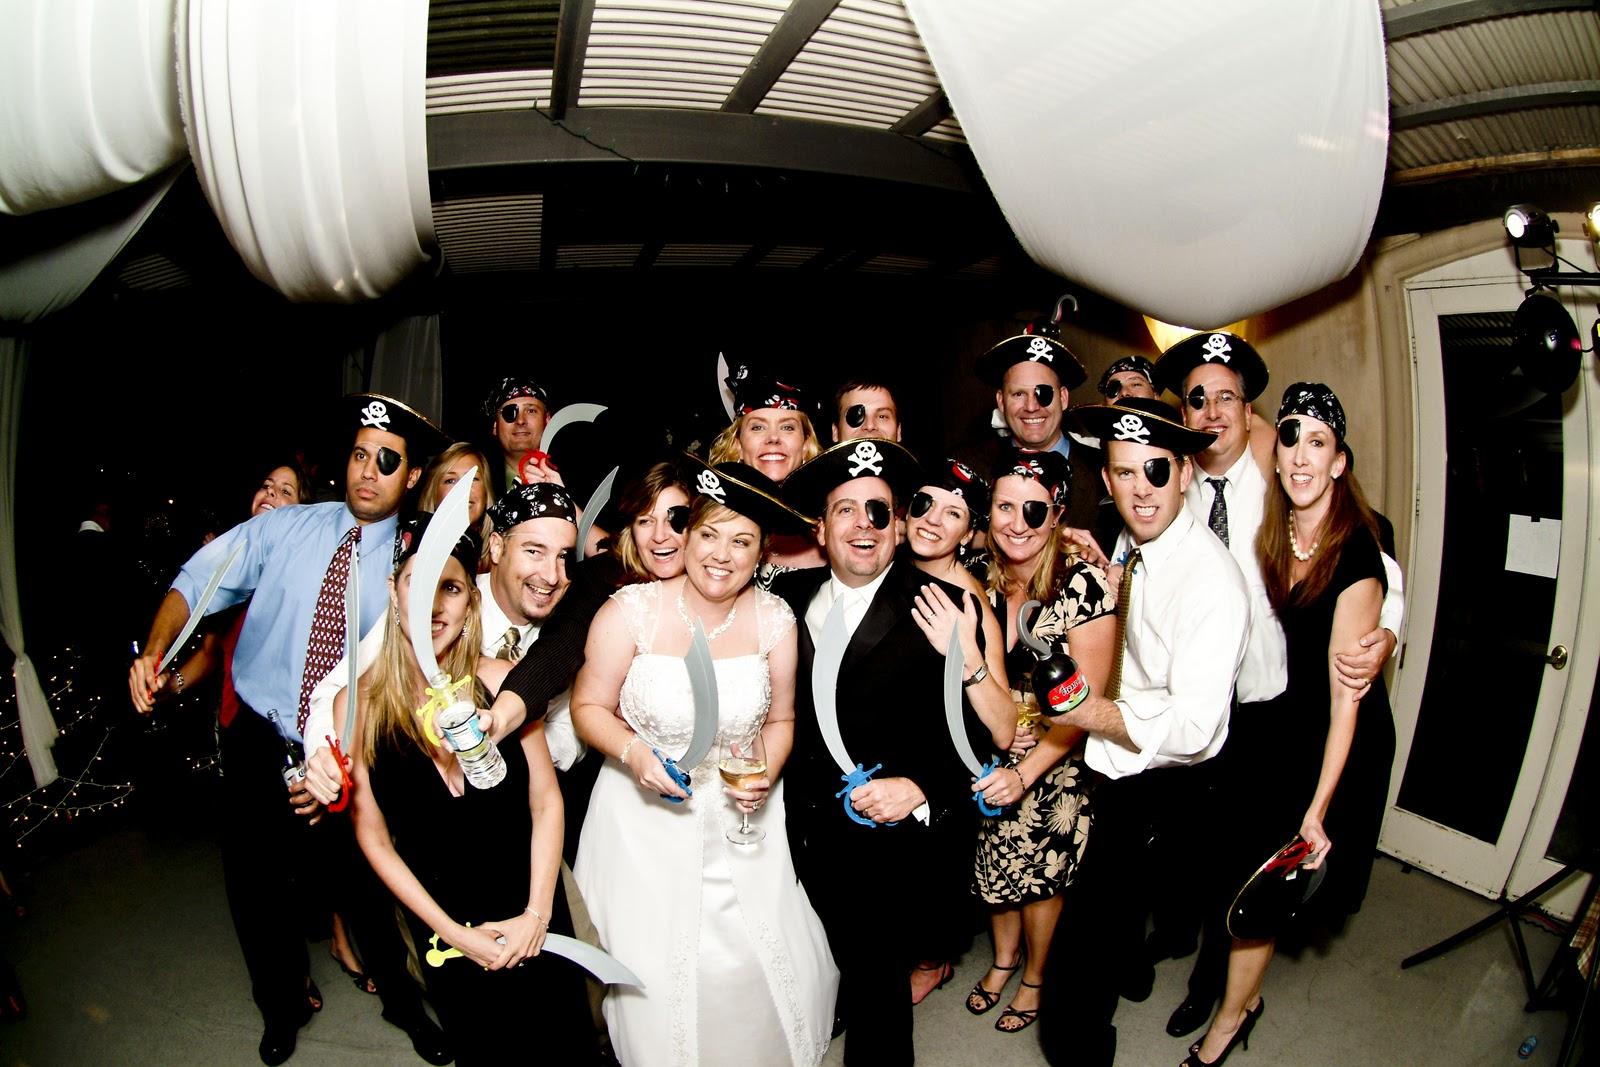 wedding jeannie blog: halloween wedding mayhem